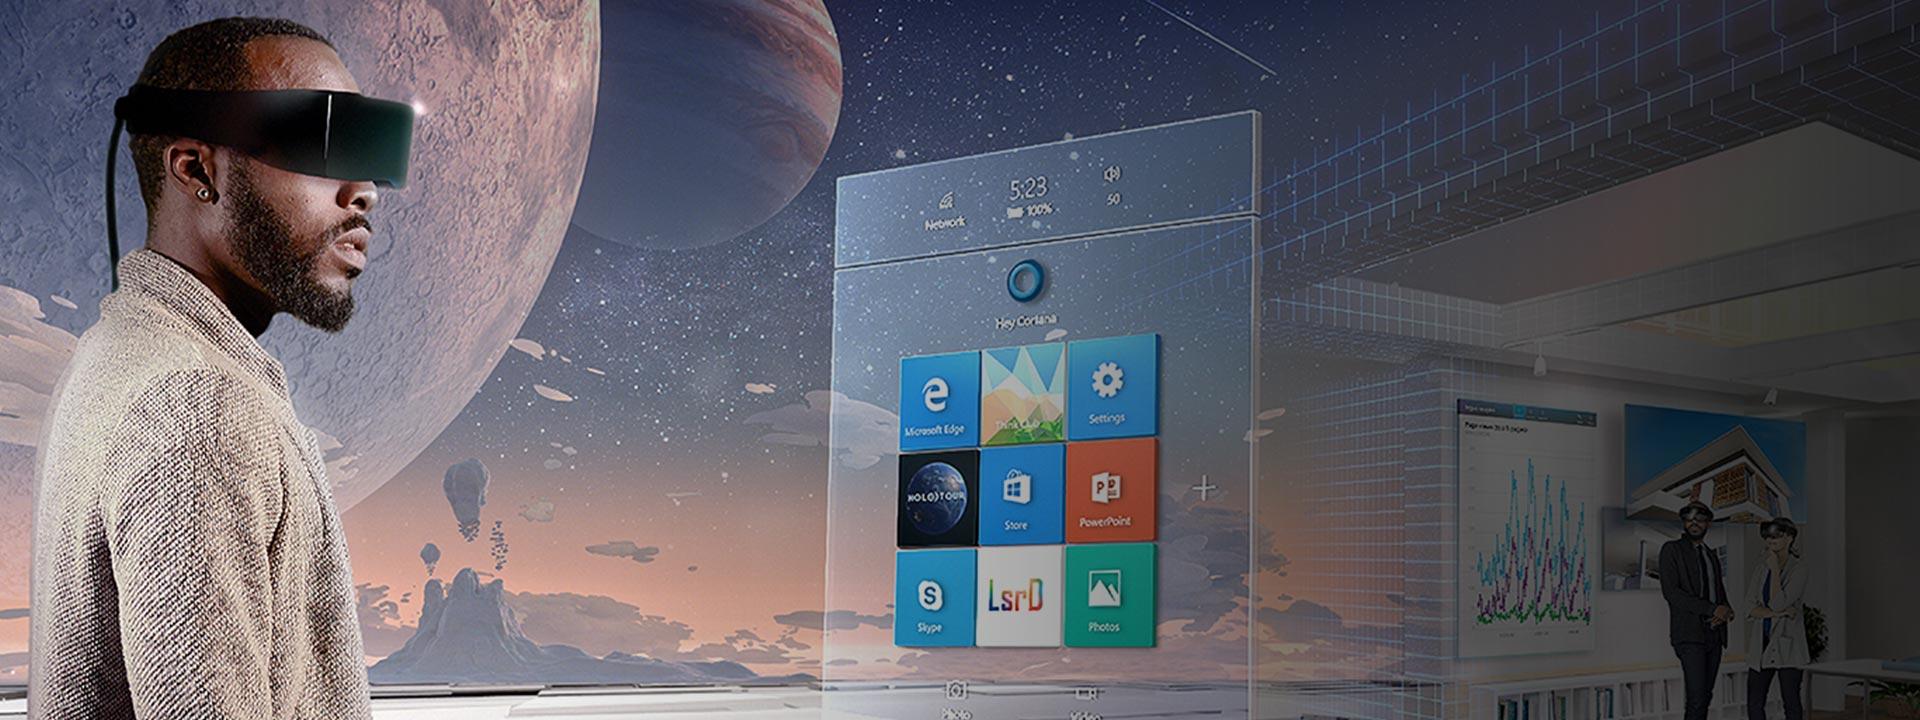 A Surface Book detaches next to a Macbook Pro